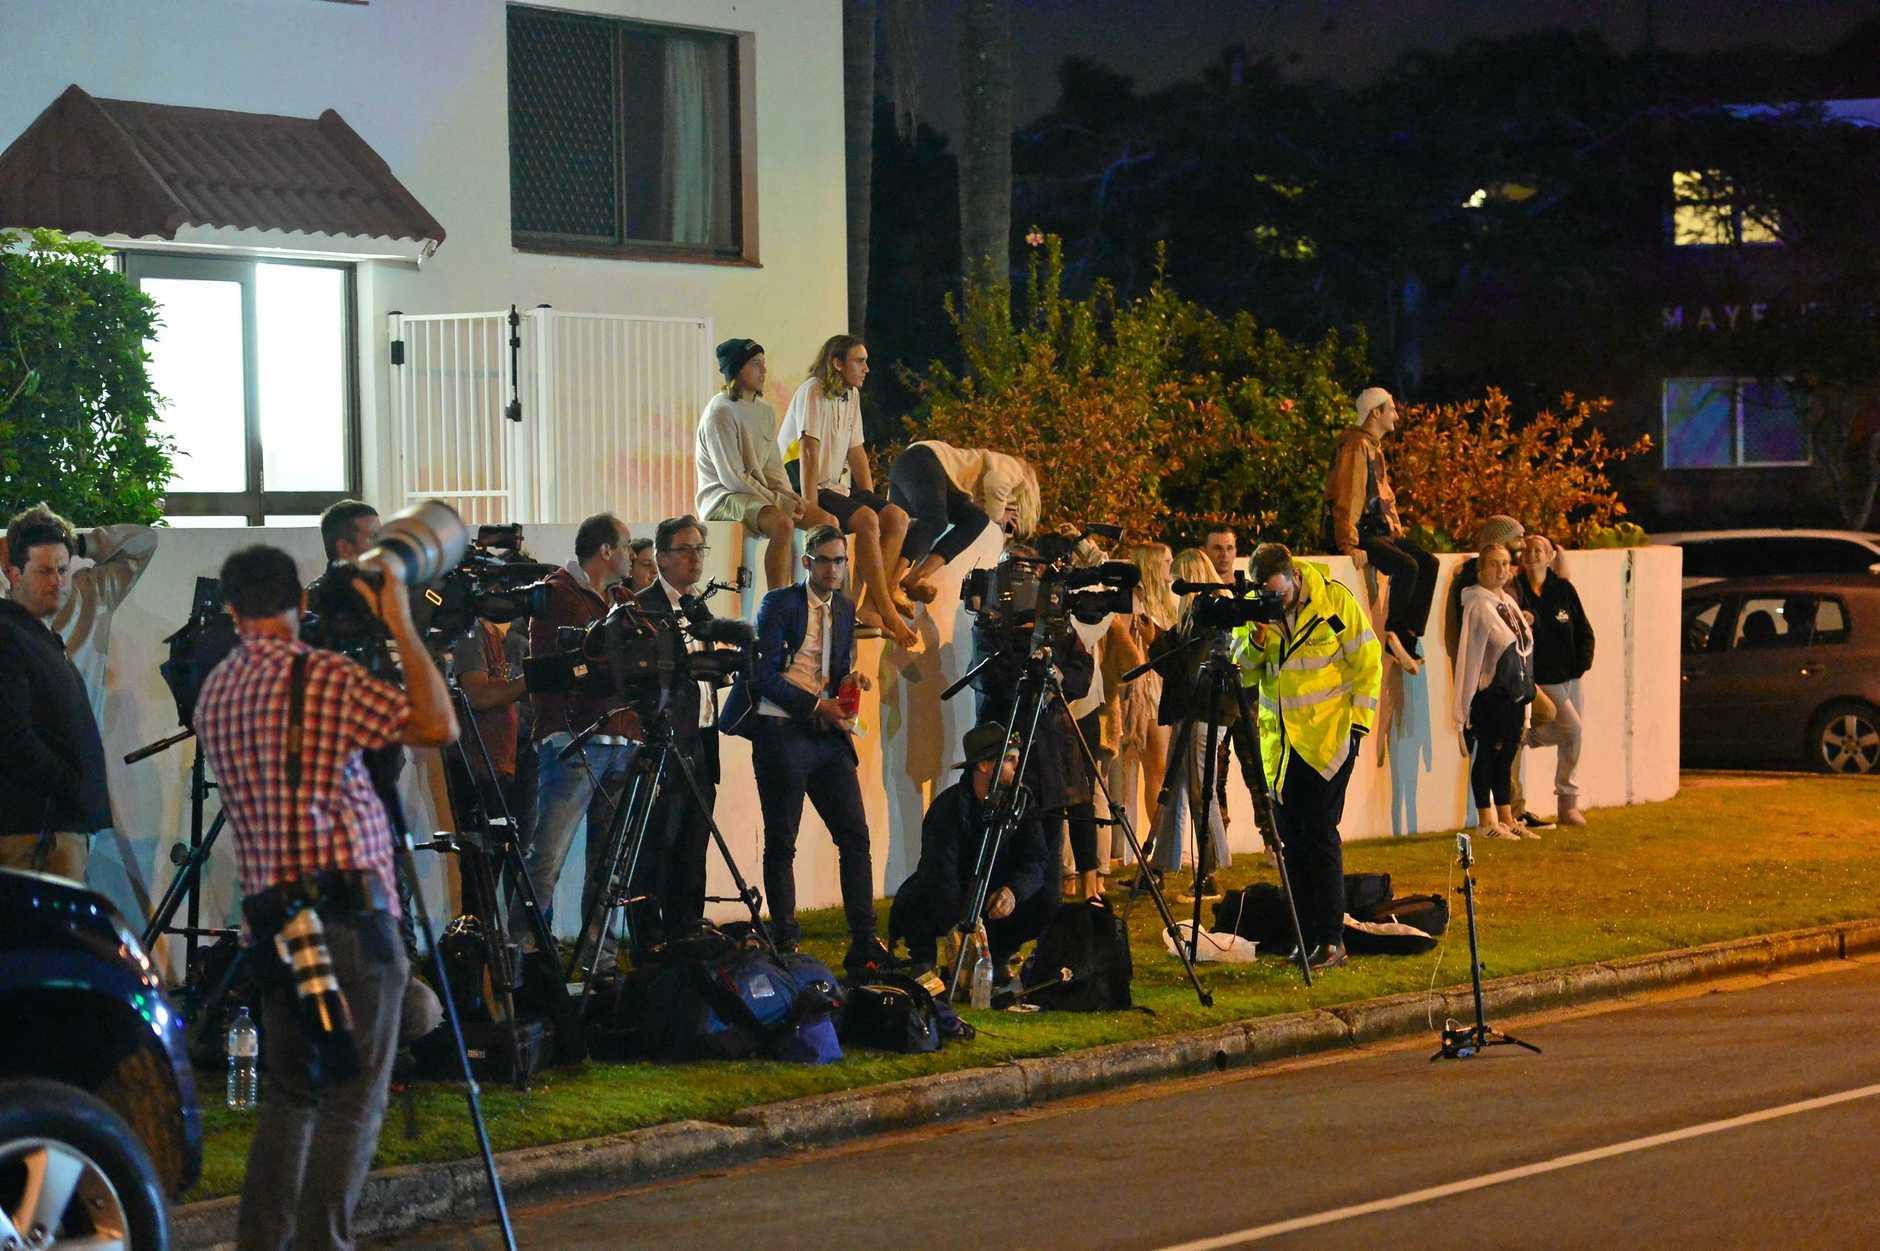 Zlatko Sikorsky Juan Street in Alexandra Headland in lock-down as police negotiate.